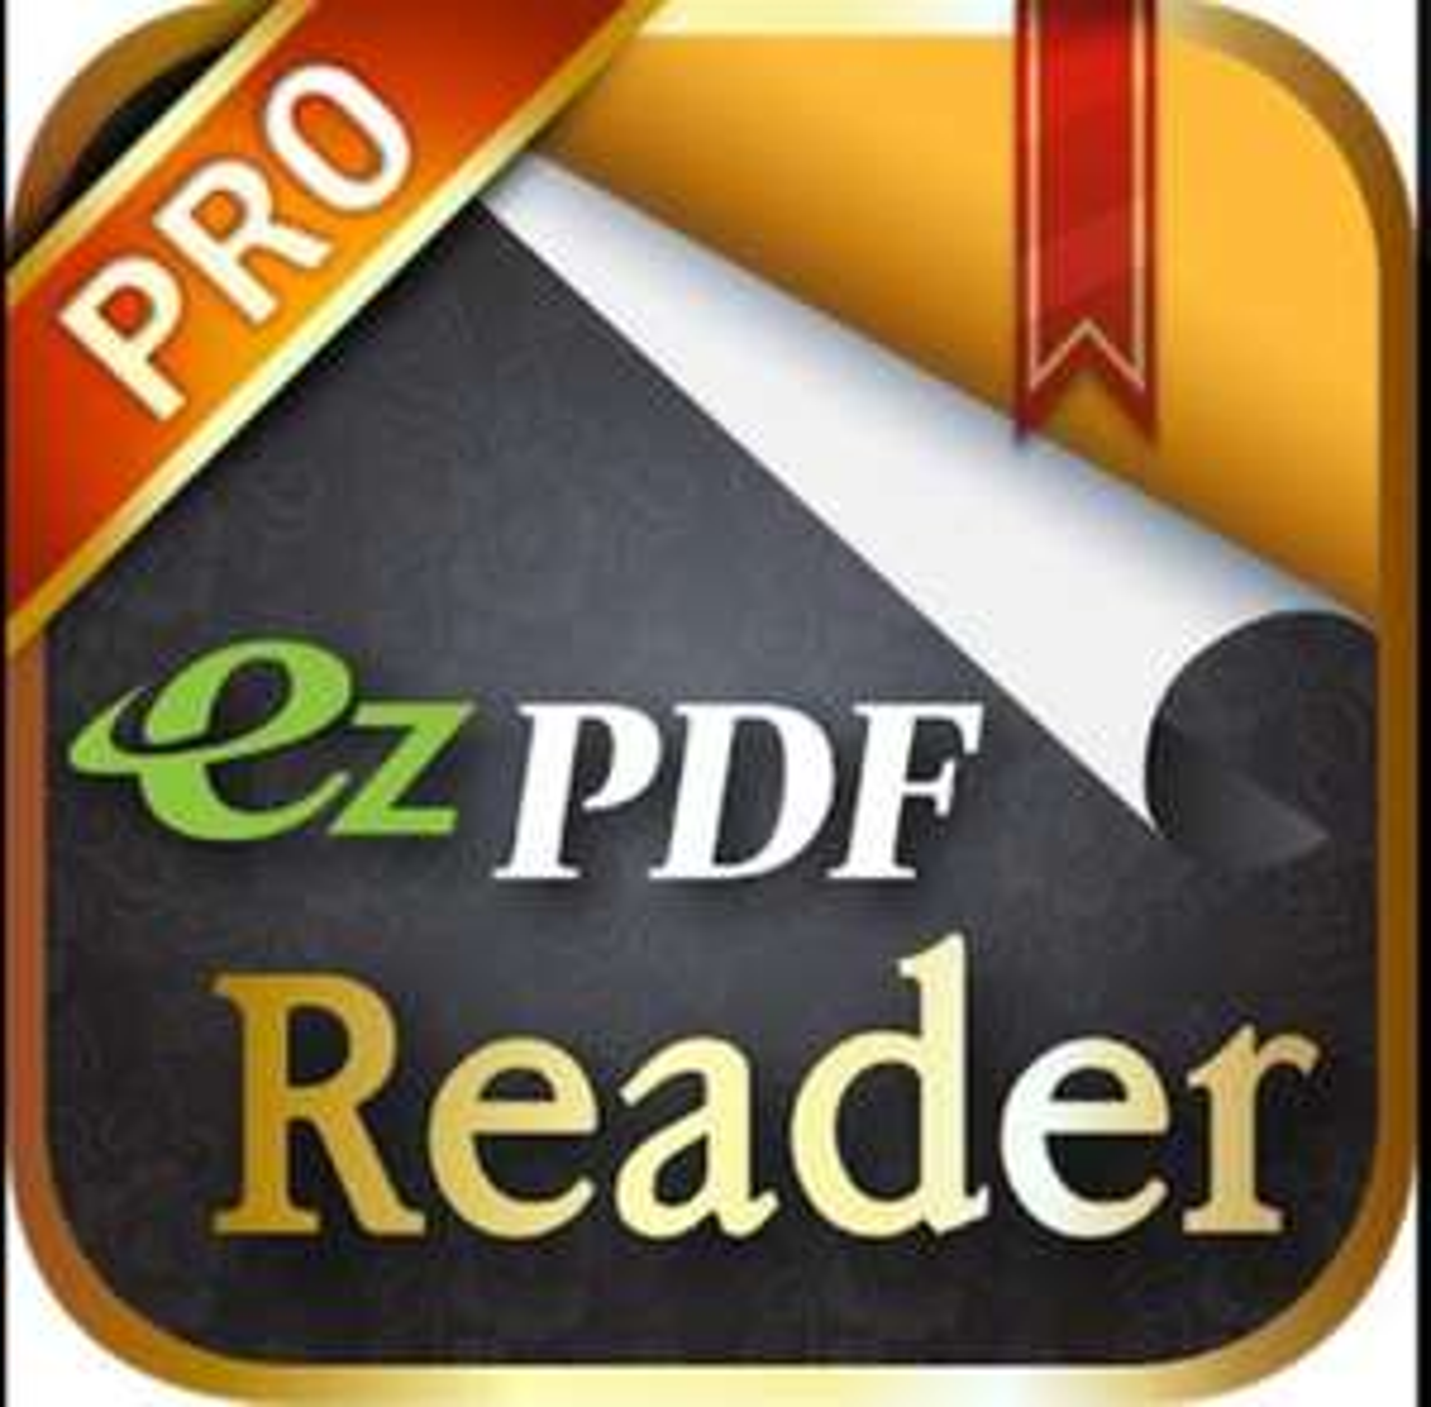 ezPDF Reader Pro, kostenlos (Google Play Store)